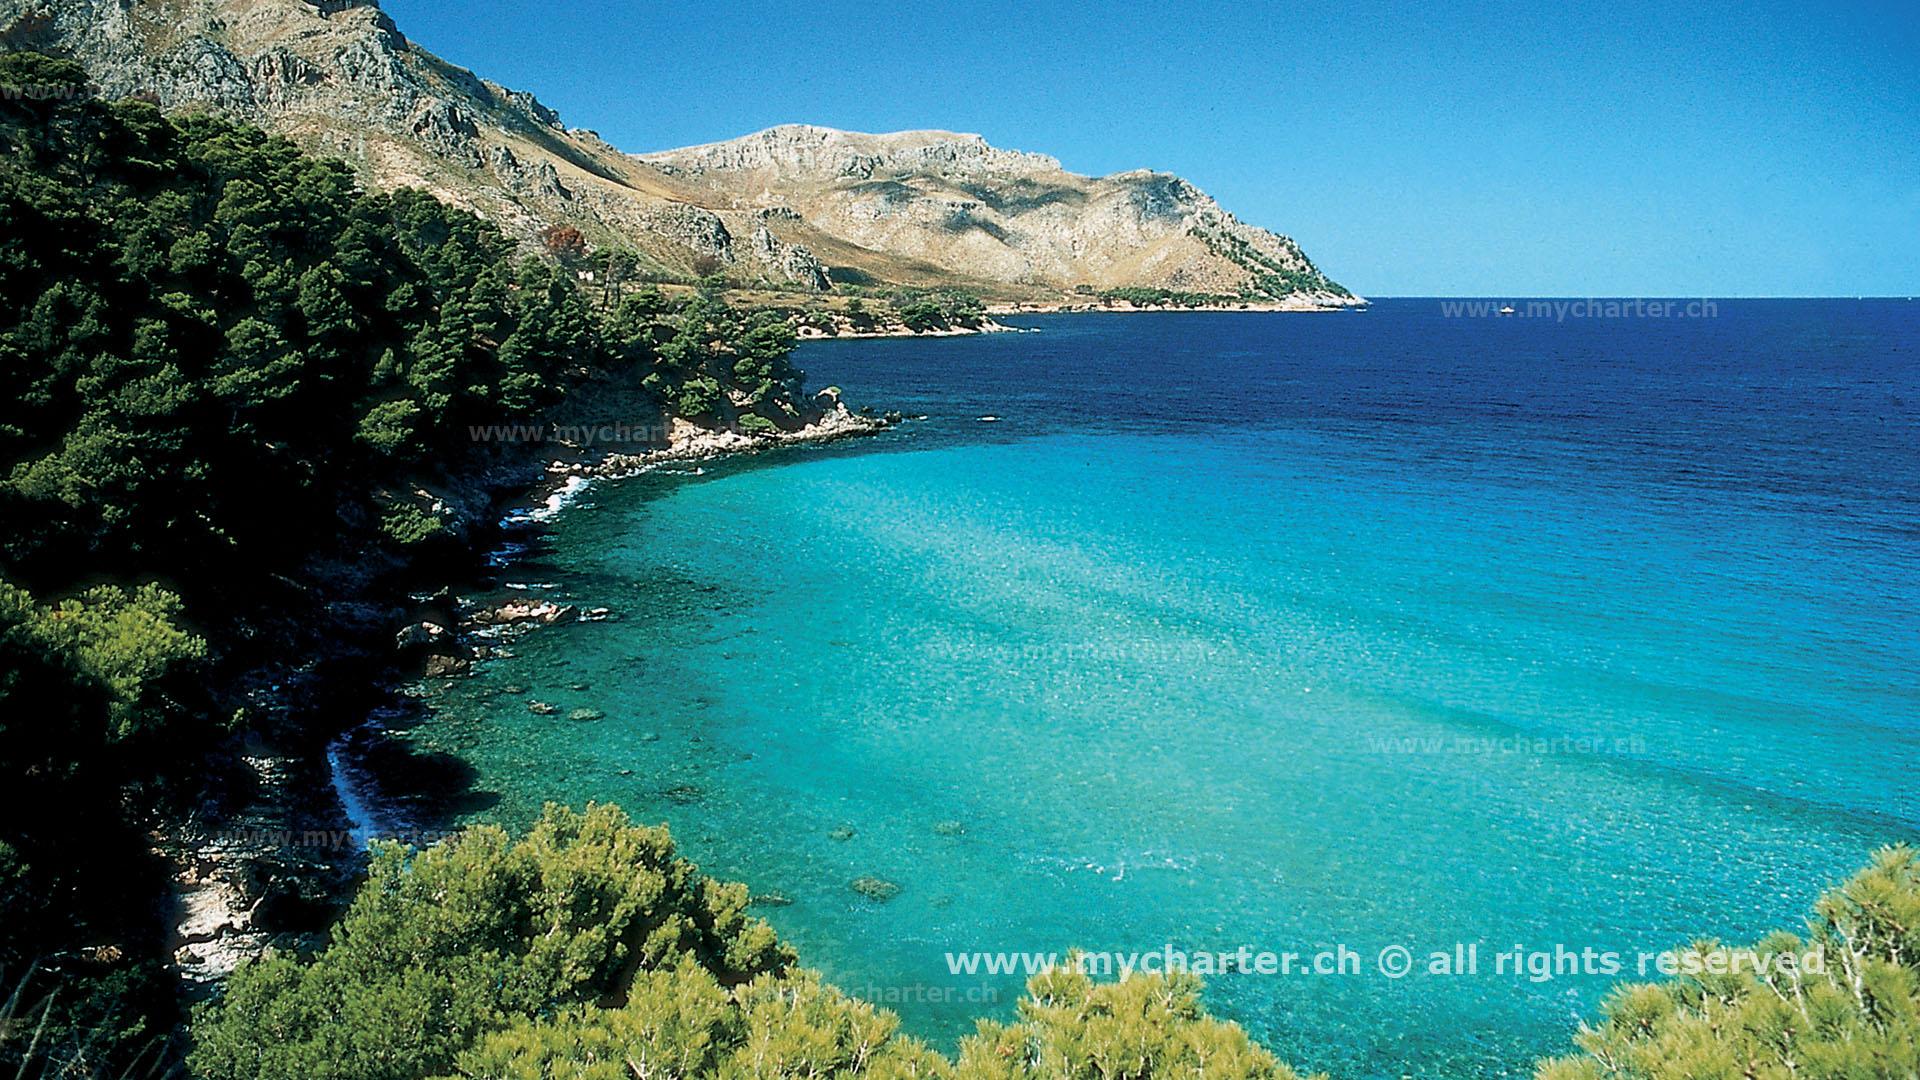 Mallorca - Puerto de Alcudia